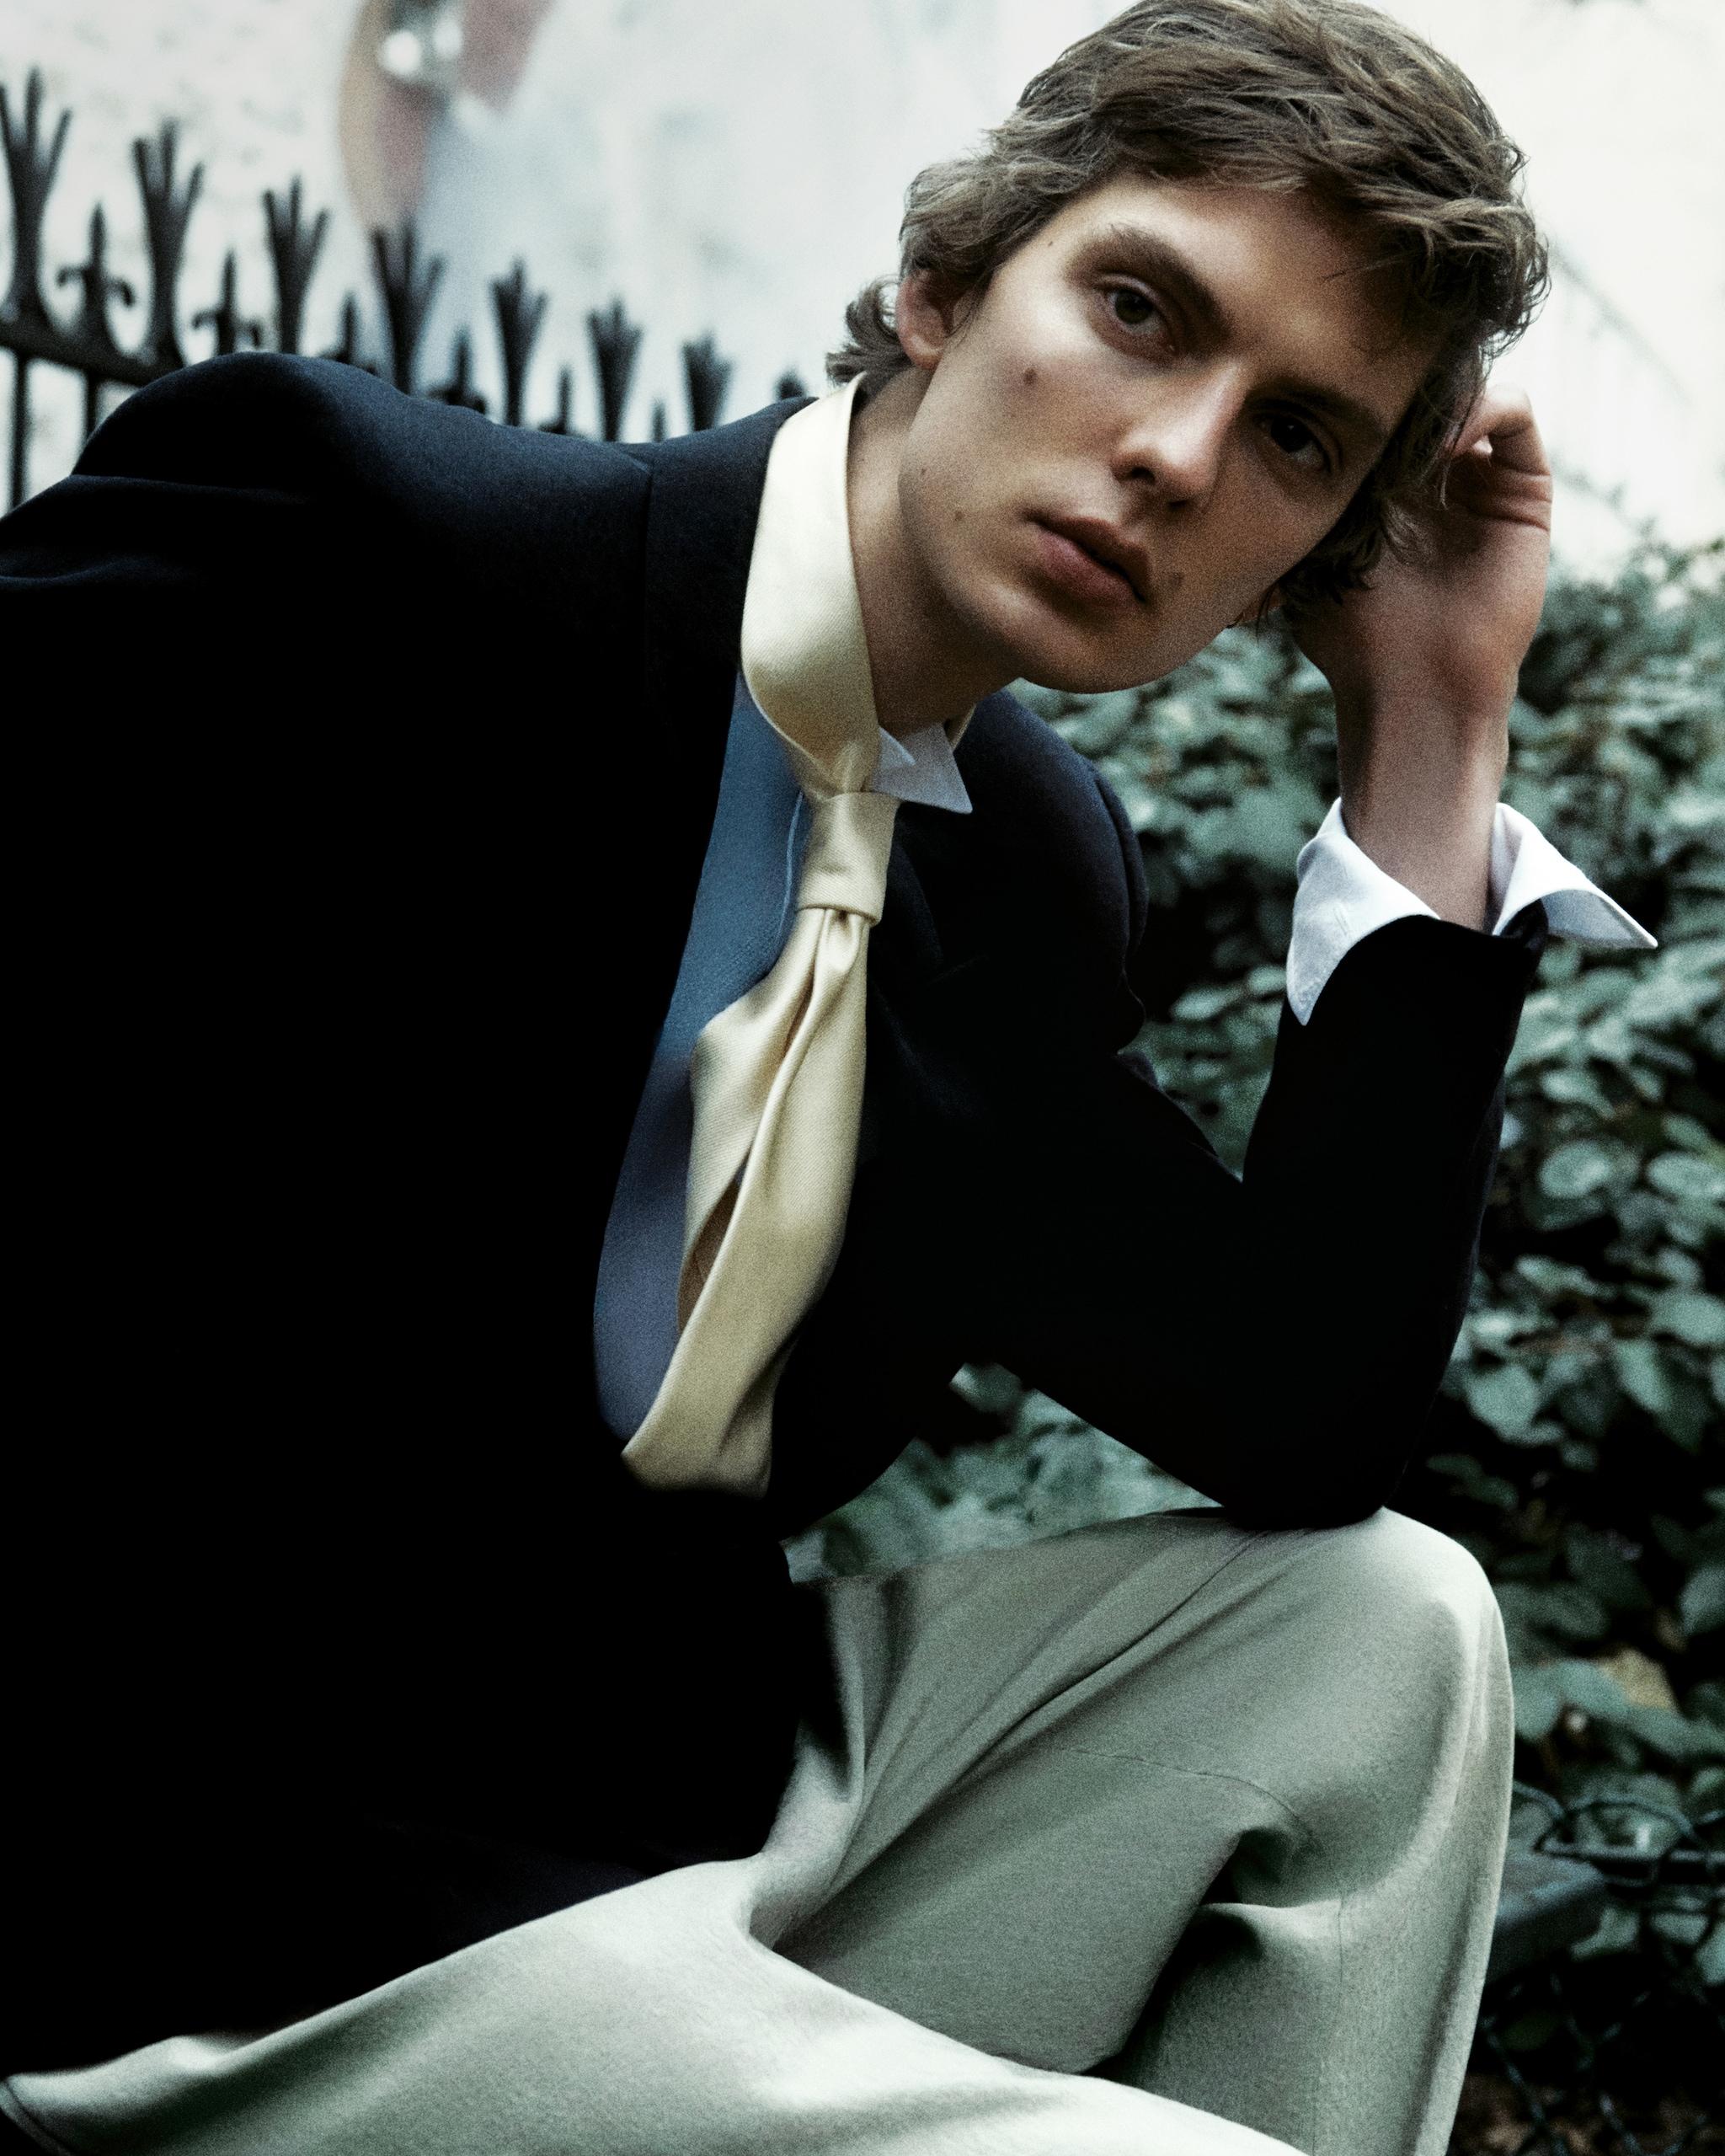 Giacca in lino, lana, seta, ERMENEGILDOZEGNA (1.850 €). Camicia da smoking, RALPHLAUREN (450 €). Pantaloni in tela di lana stretch, EMPORIO ARMANI (430 €). Cravatta in seta, CHARVET (210 €).